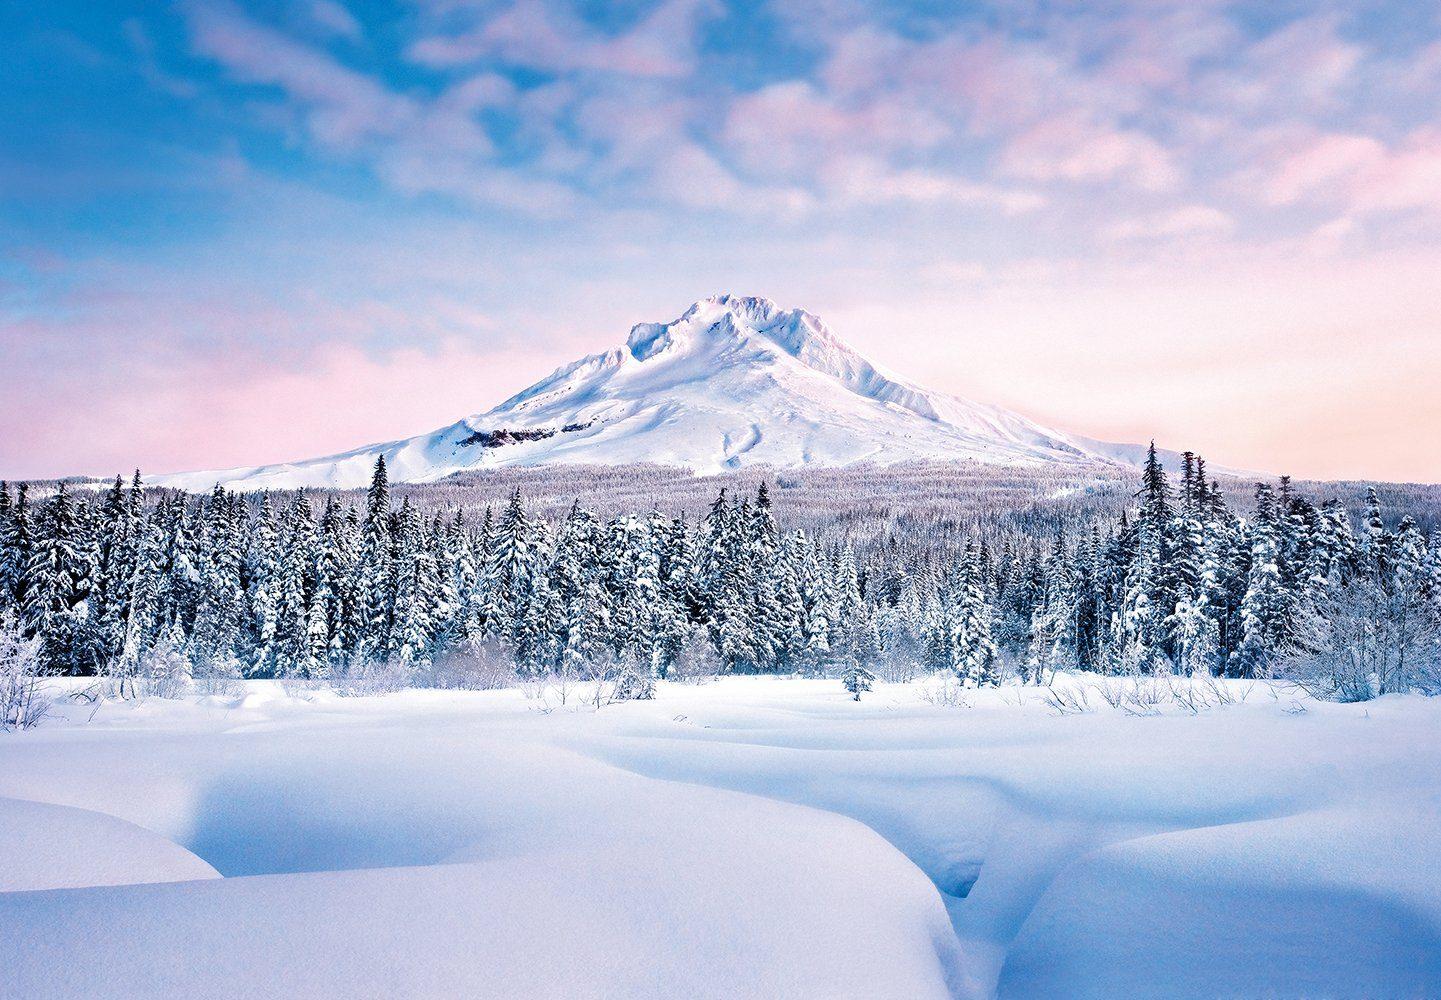 Fototapete »Mountain Graceful«, 8-teilig, 366x254 cm